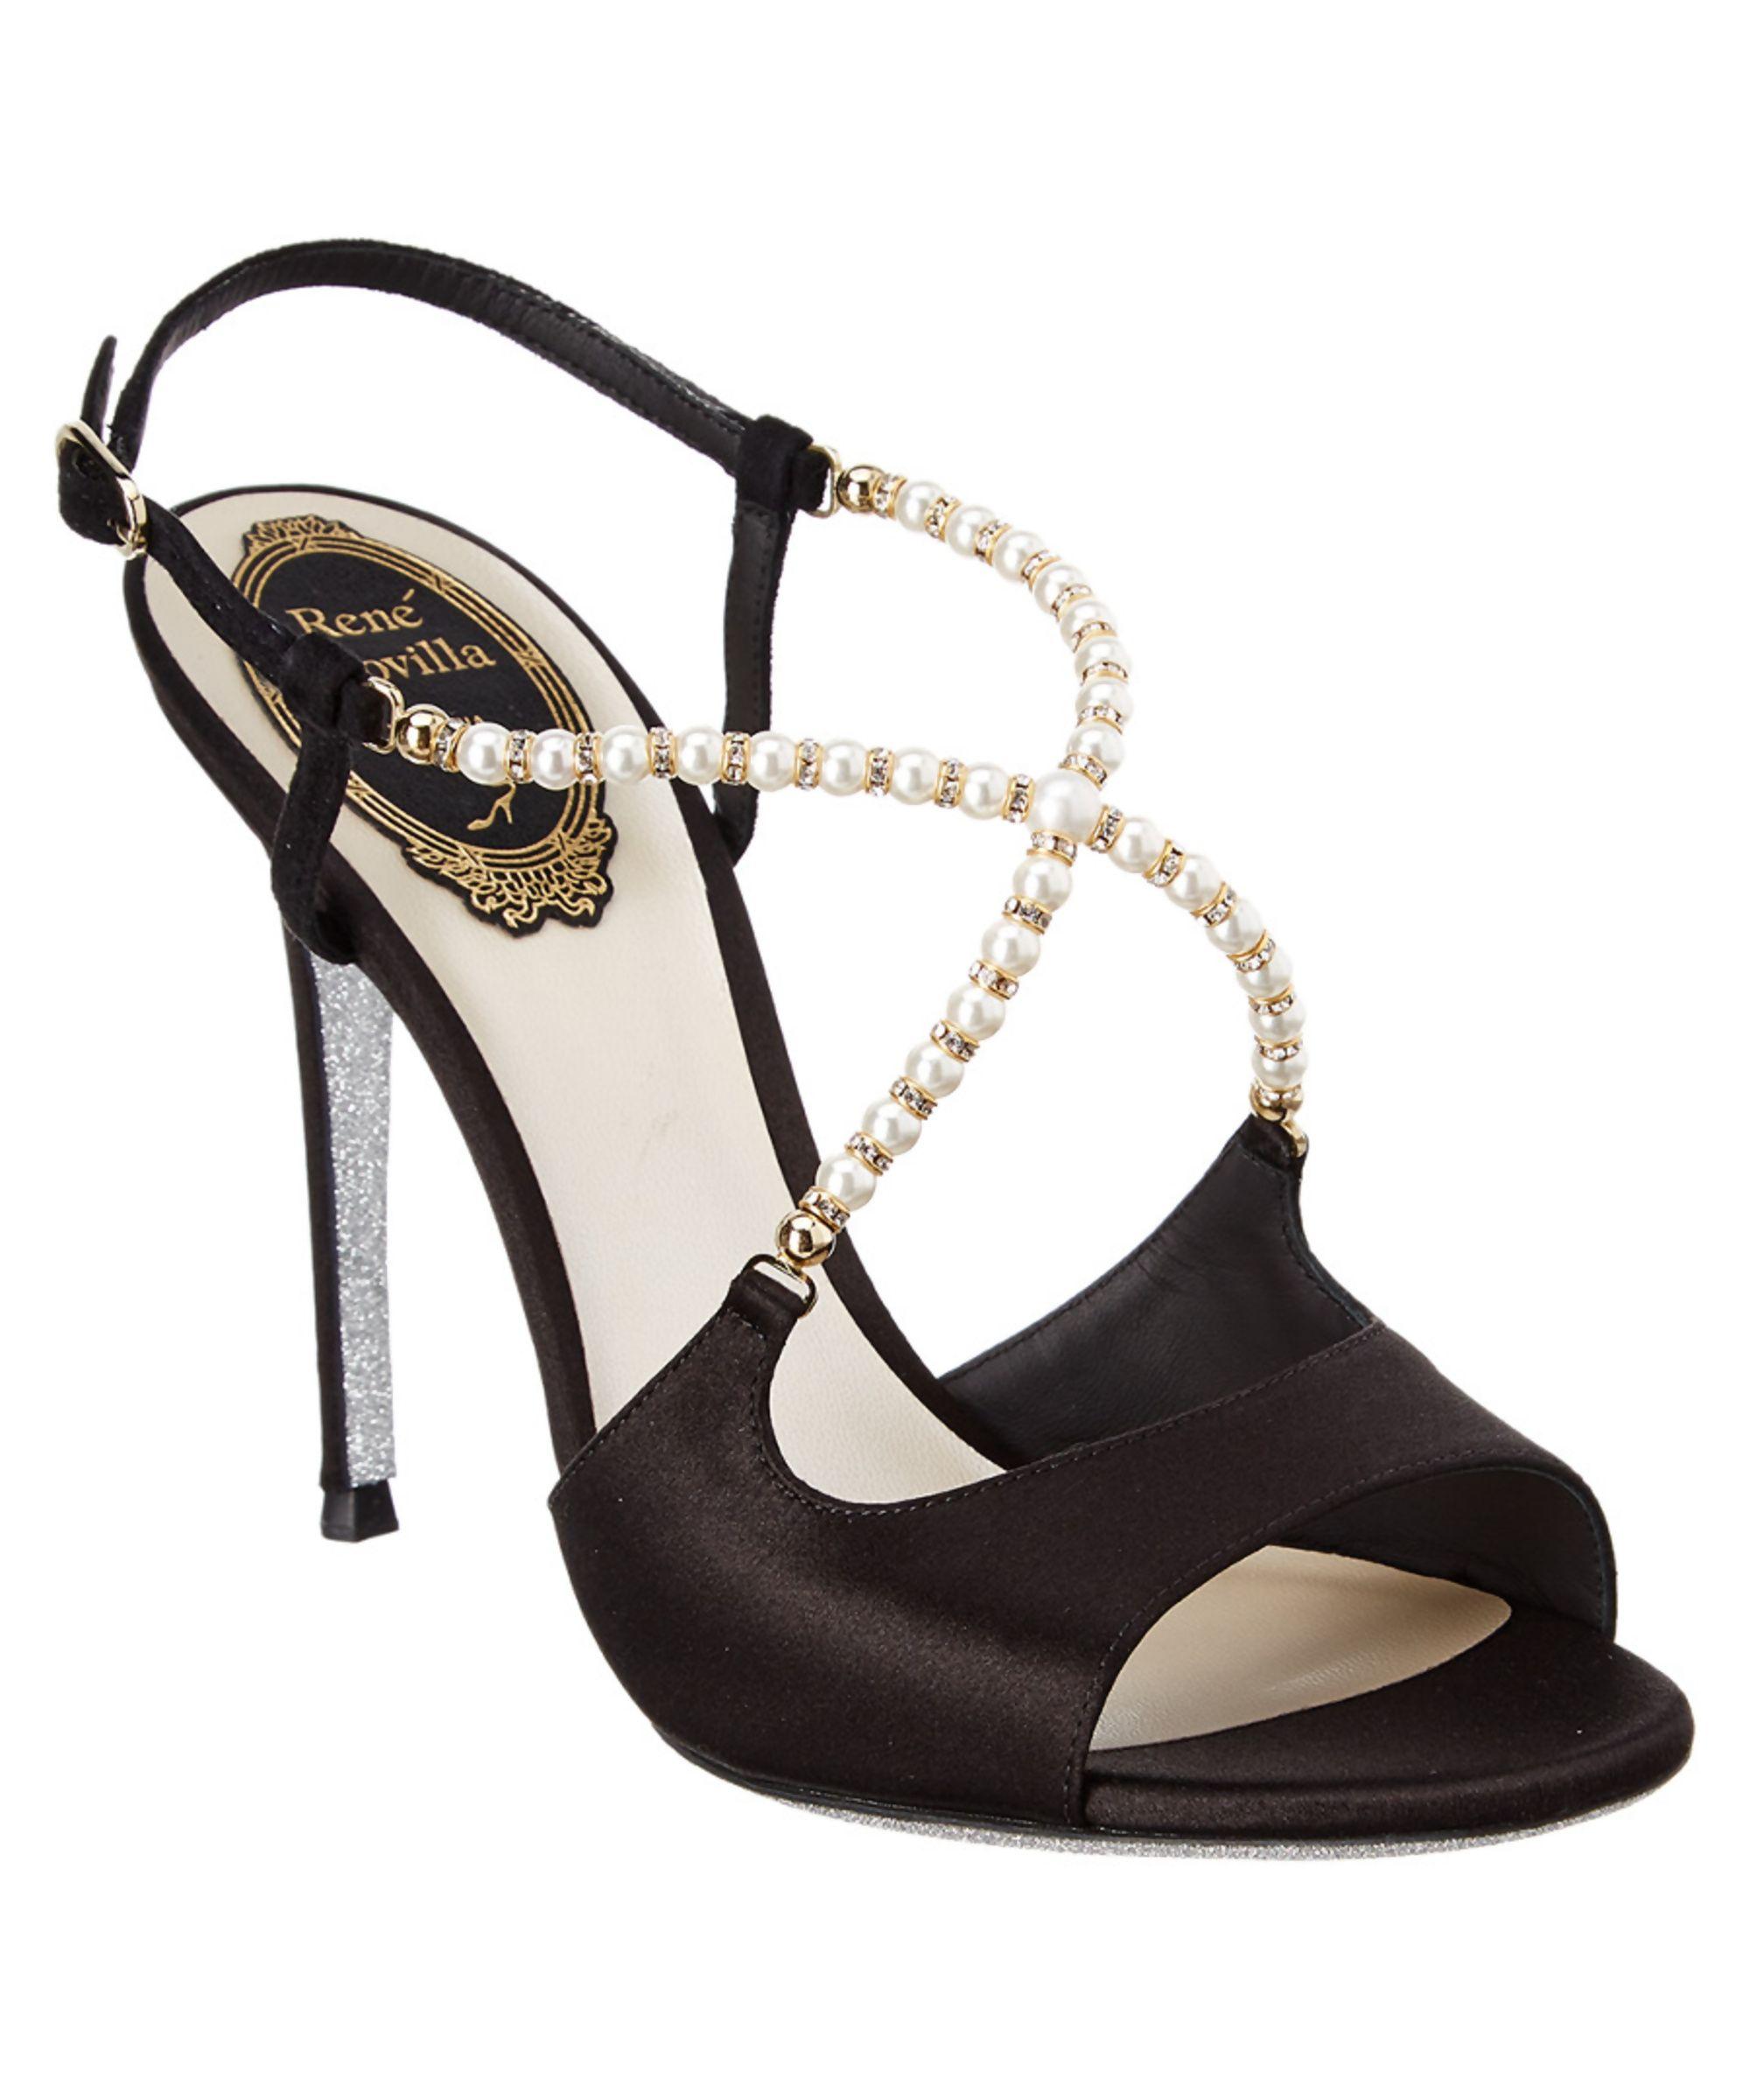 RENE CAOVILLA | Rene Caovilla Embellished Satin Sandal #Shoes #Sandals #RENE  CAOVILLA